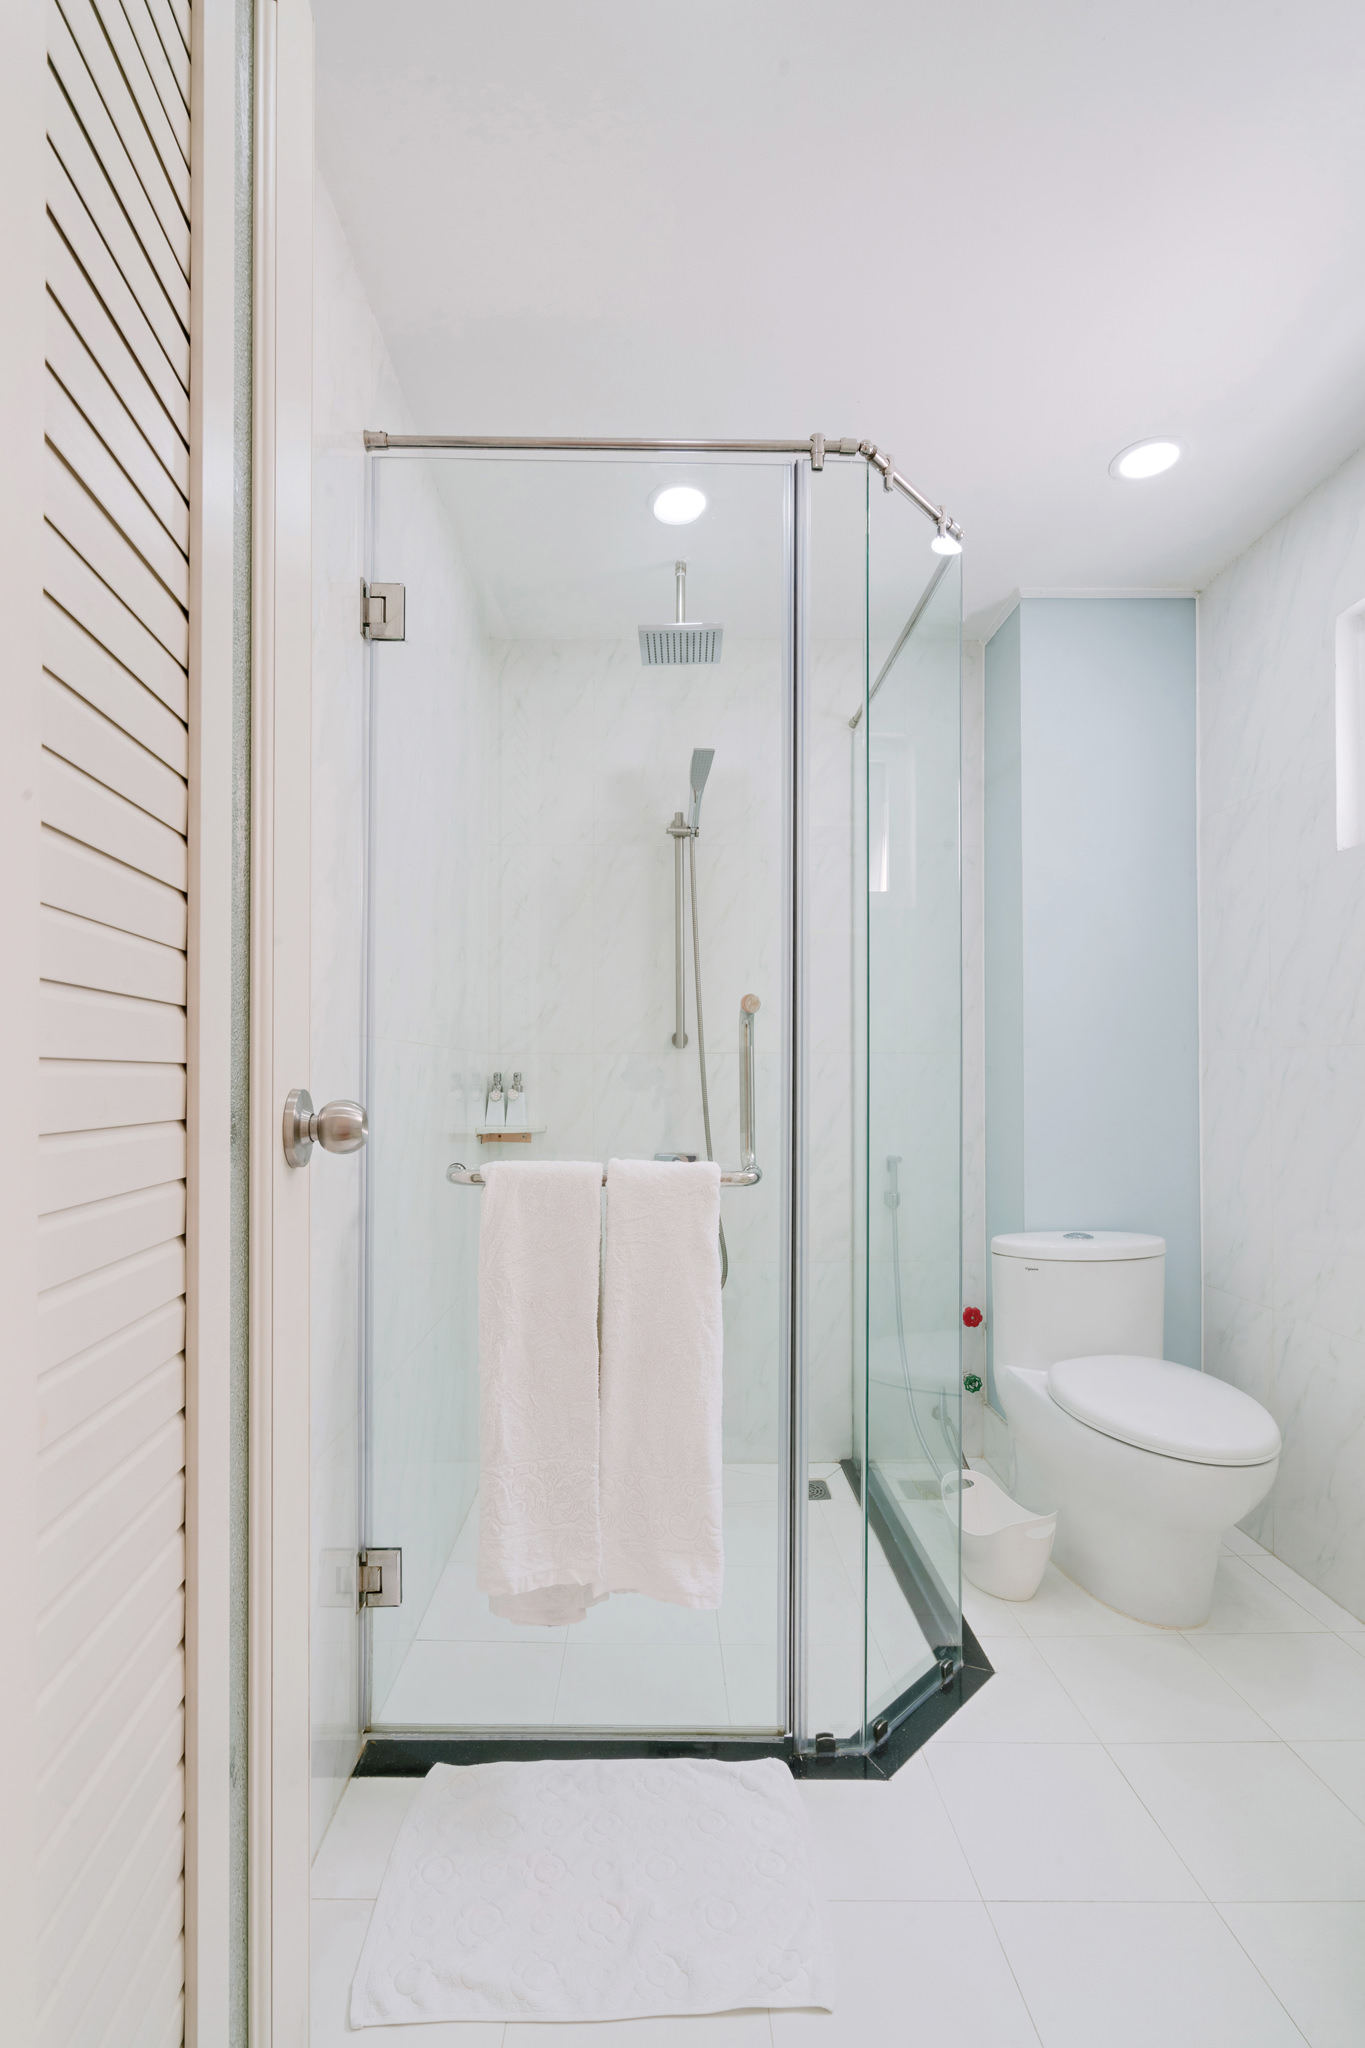 20180529 - Chez Mimosa - Interior - Hotel - 035.jpg